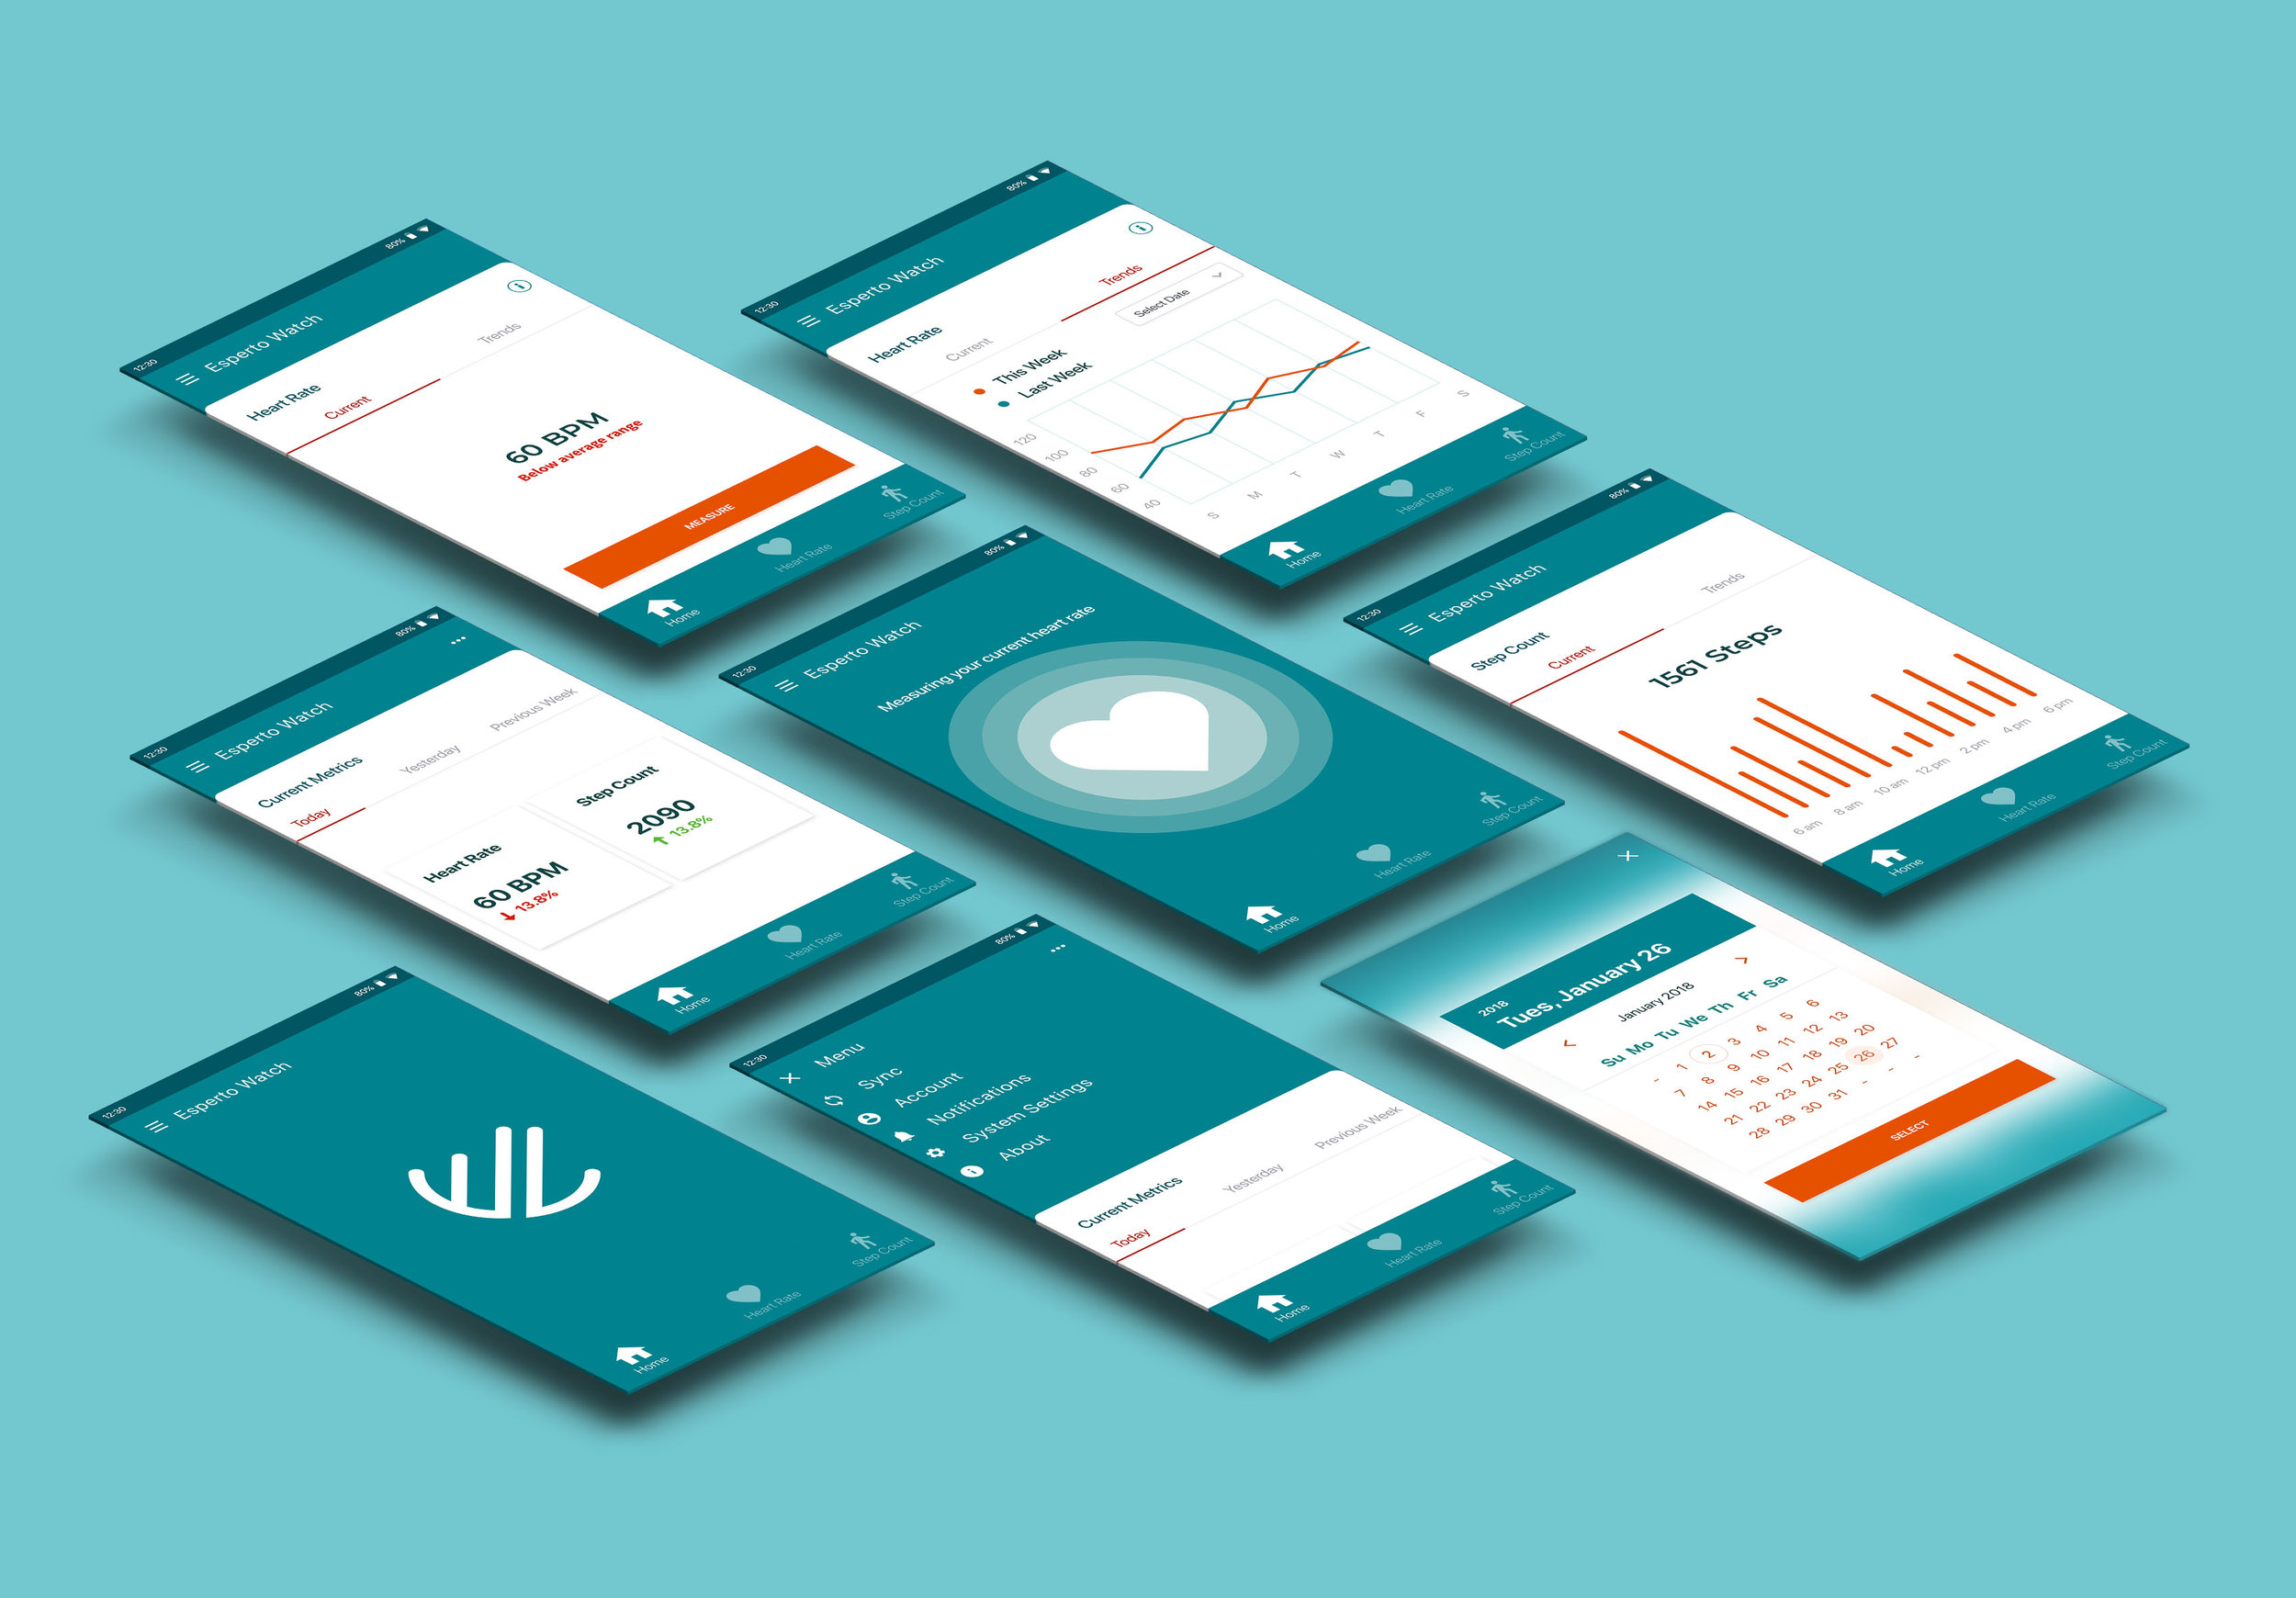 Coming Soon - Esperto Labs UI Design